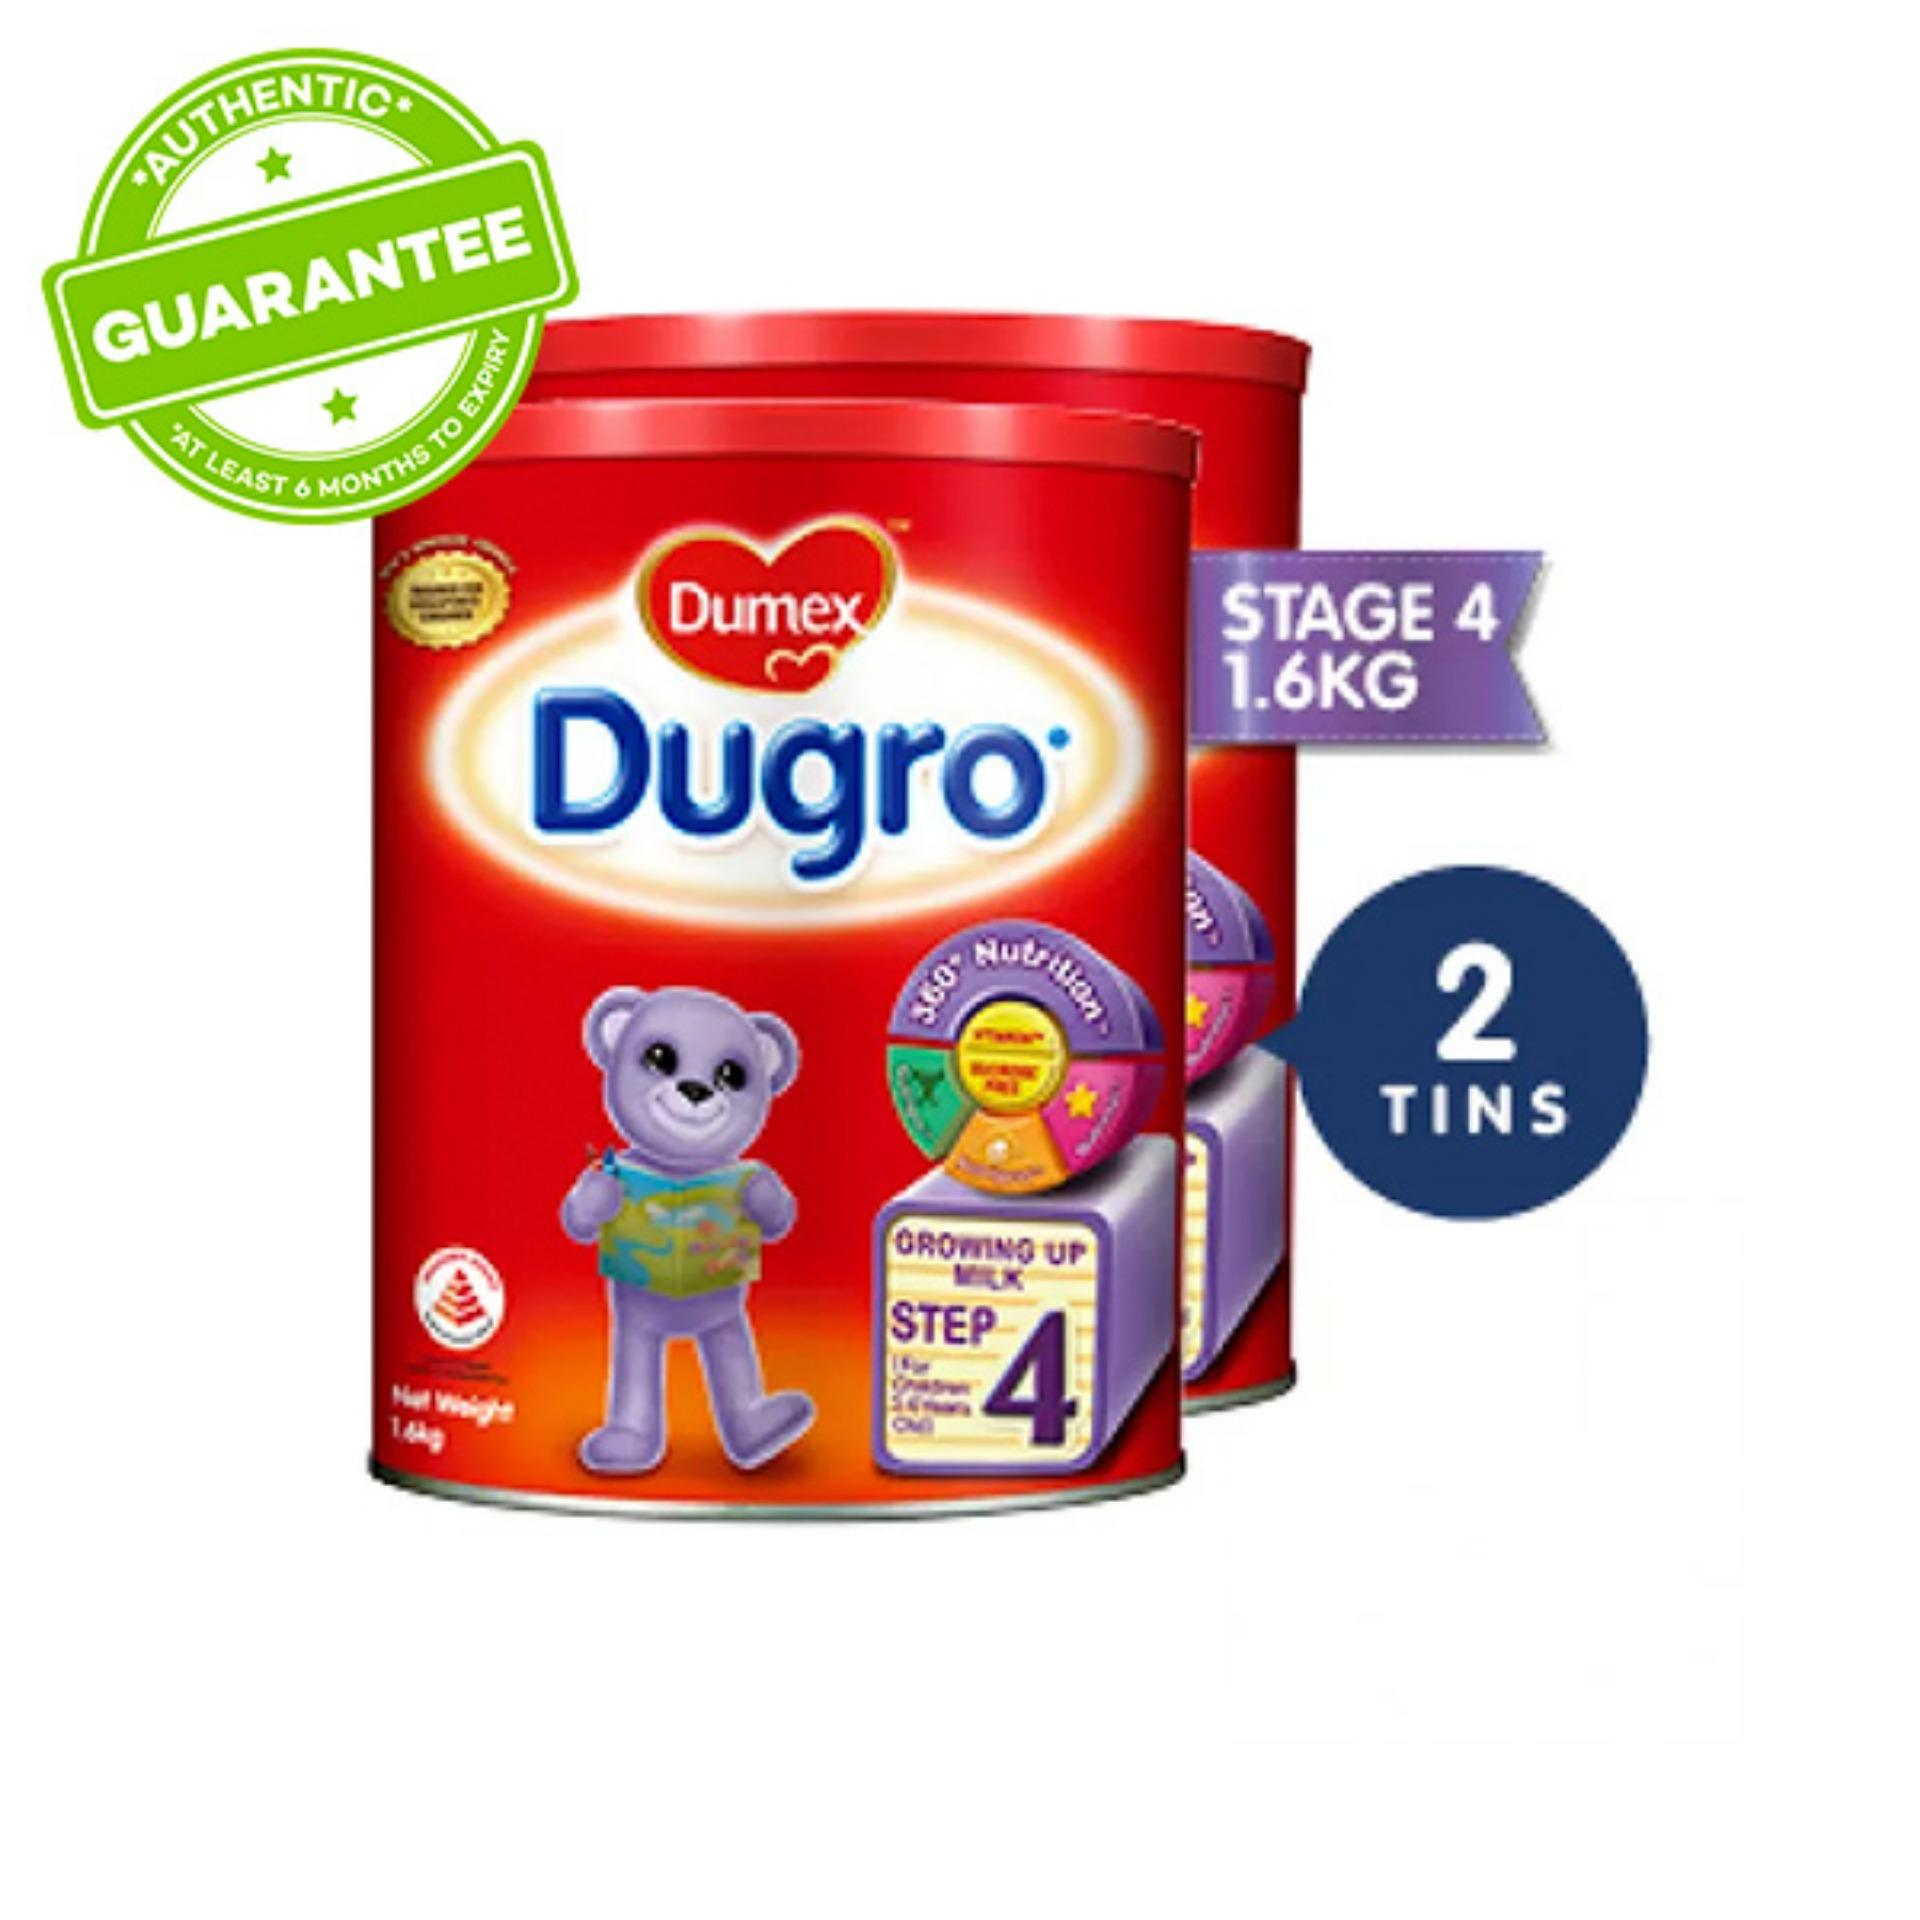 Dumex Dugro Stage 4 Growing Up Kid Milk Formula (1.6kg) X 2 By Lazada Retail Dumex.